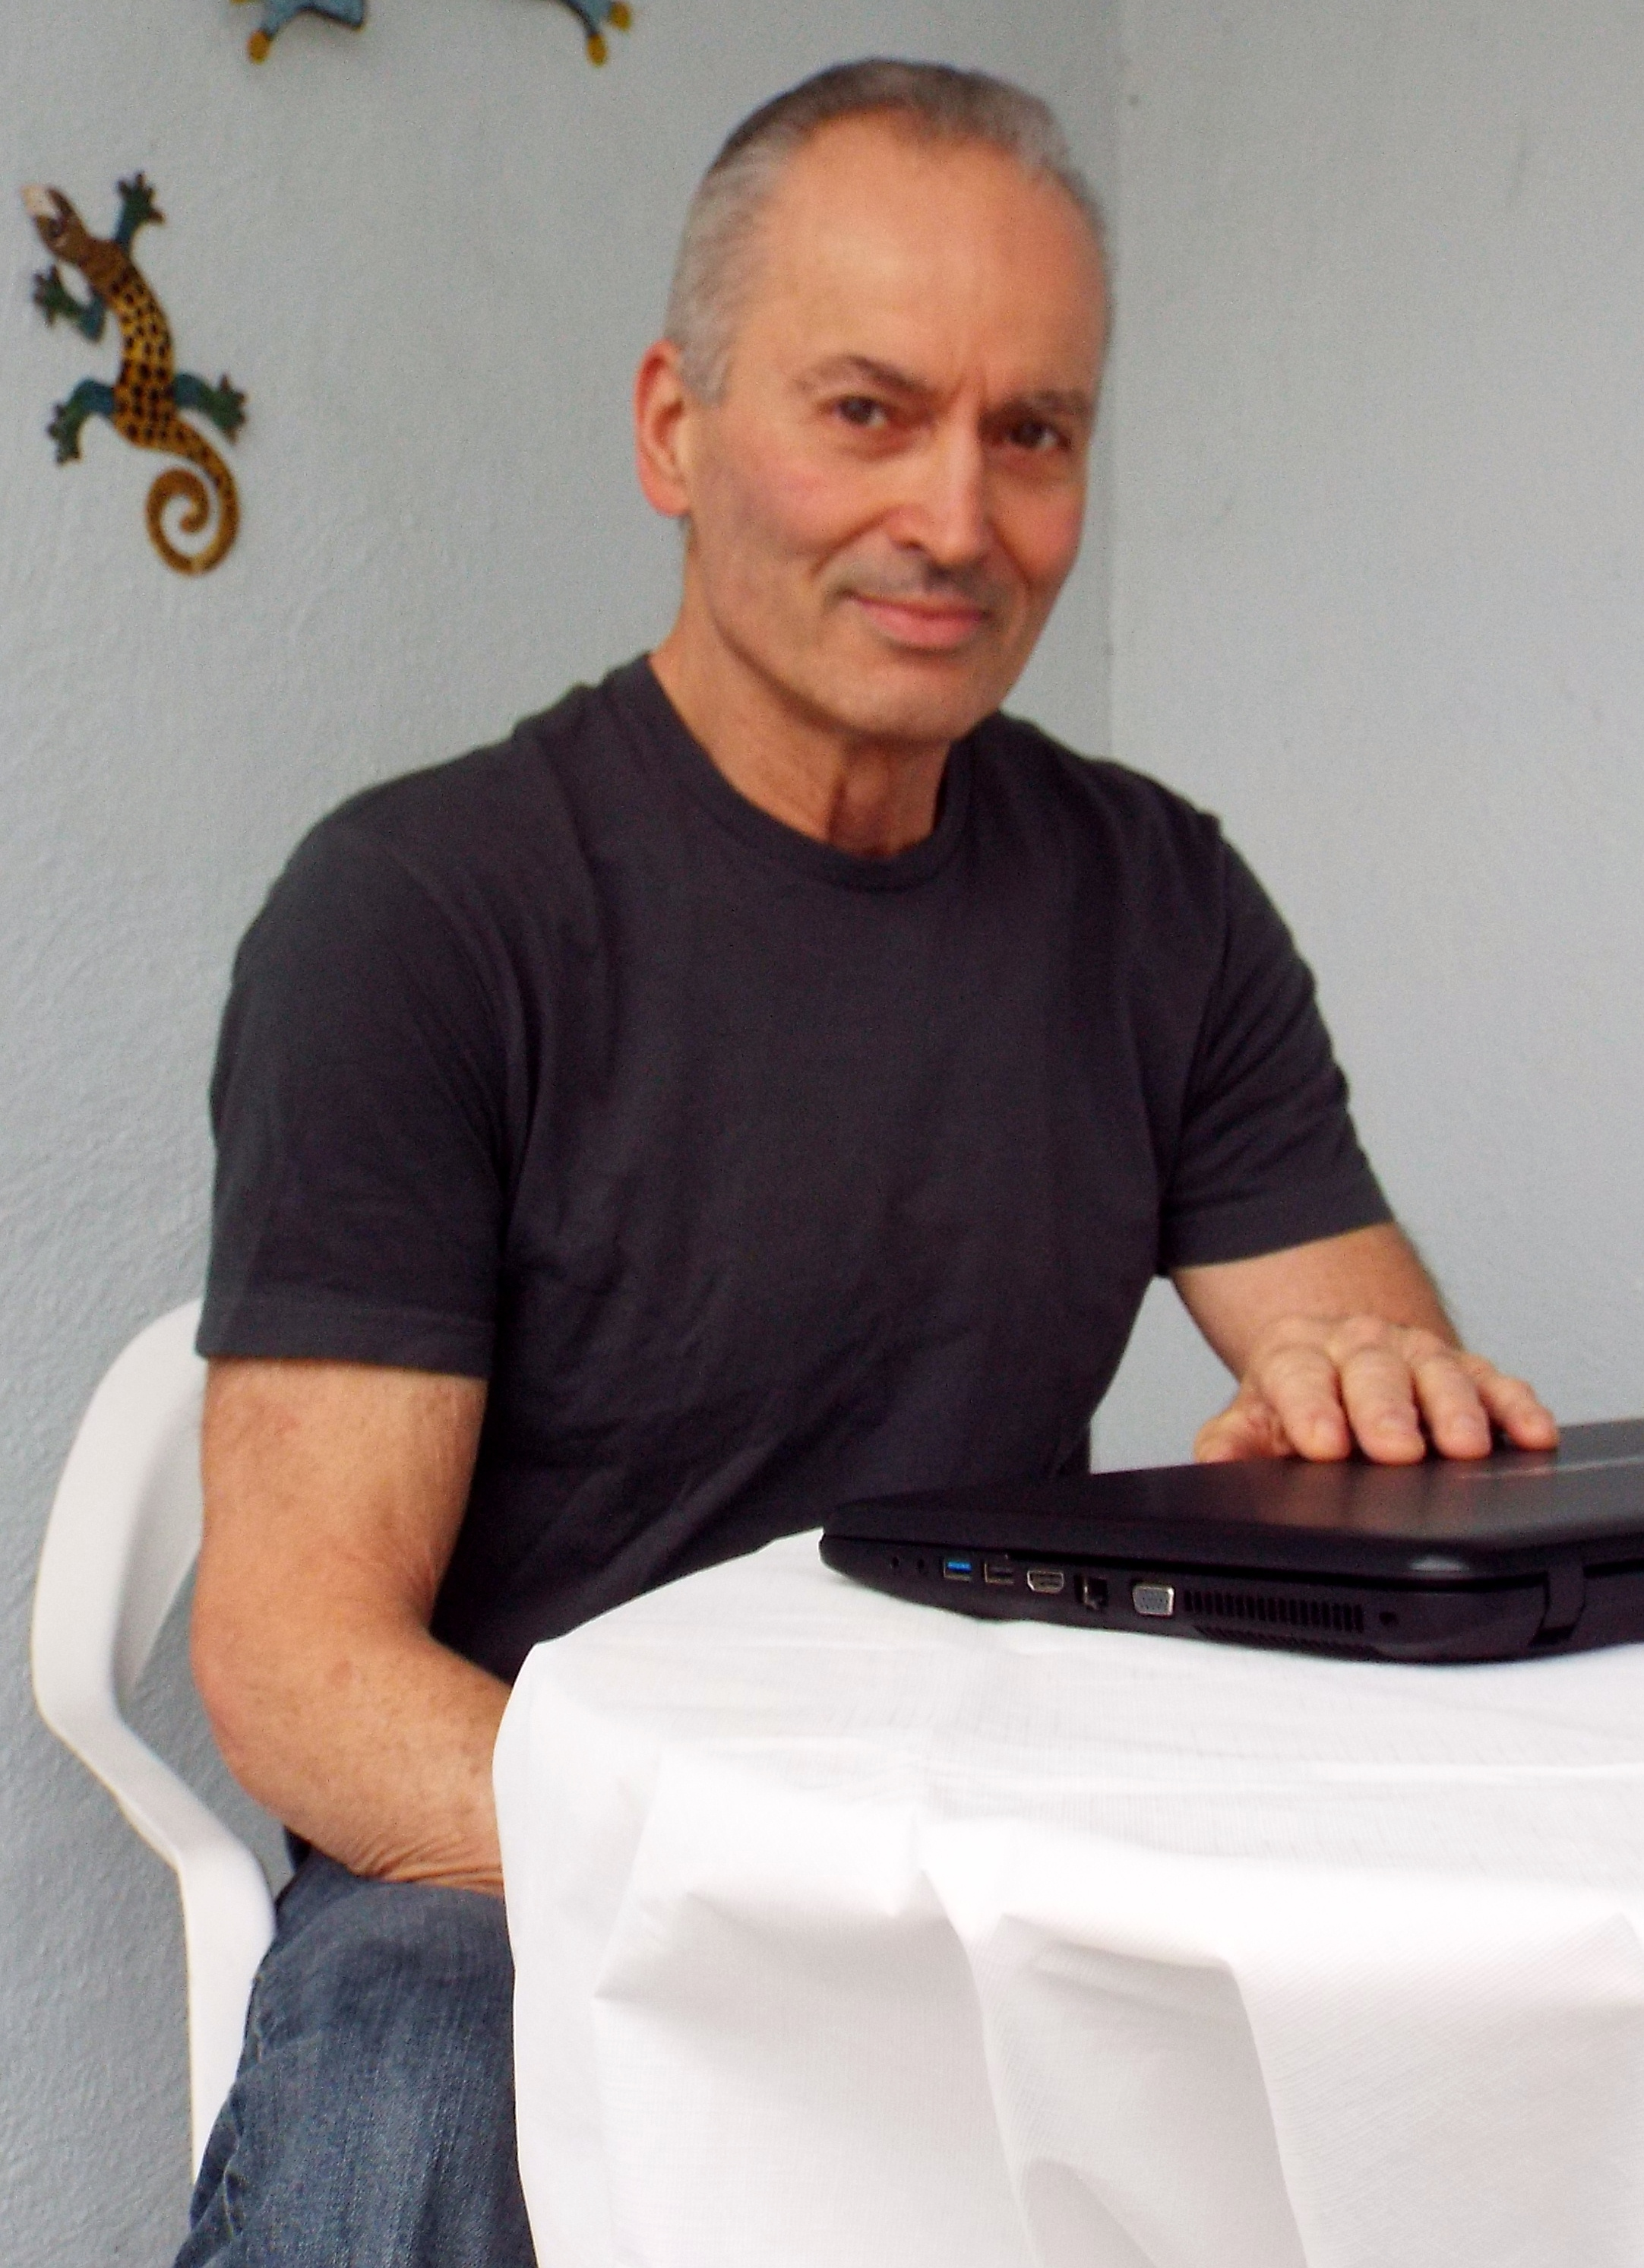 Bernard Lee DeLeo